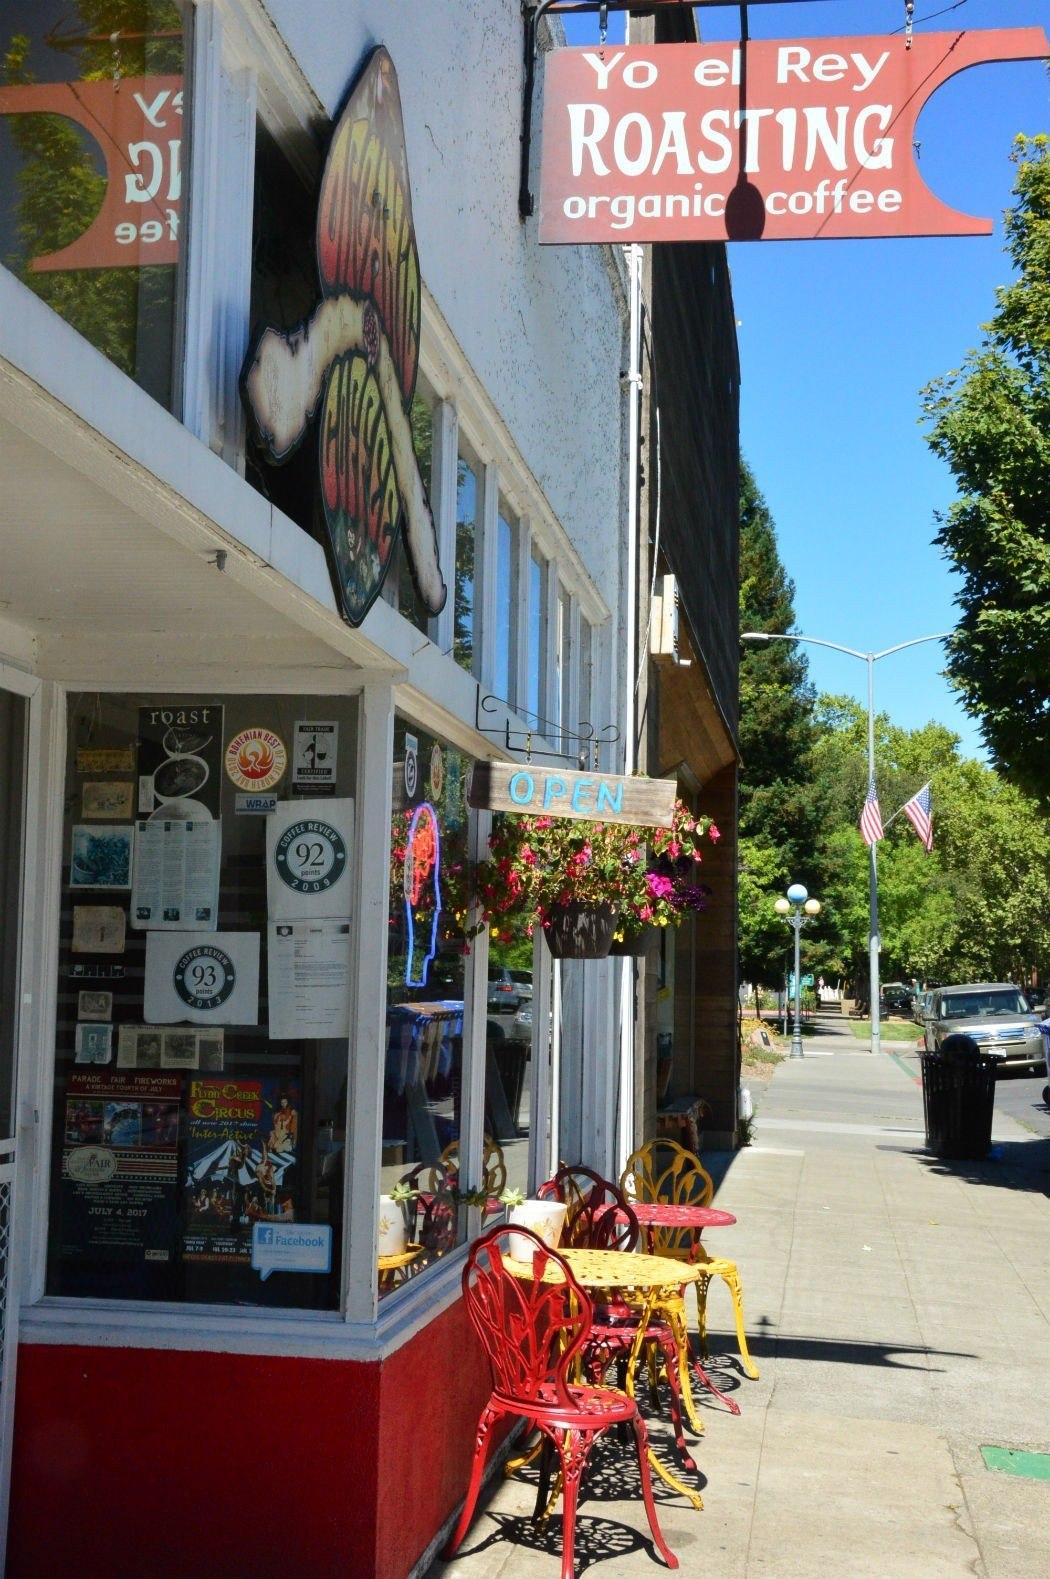 Yo El Rey coffee shop in Calistoga